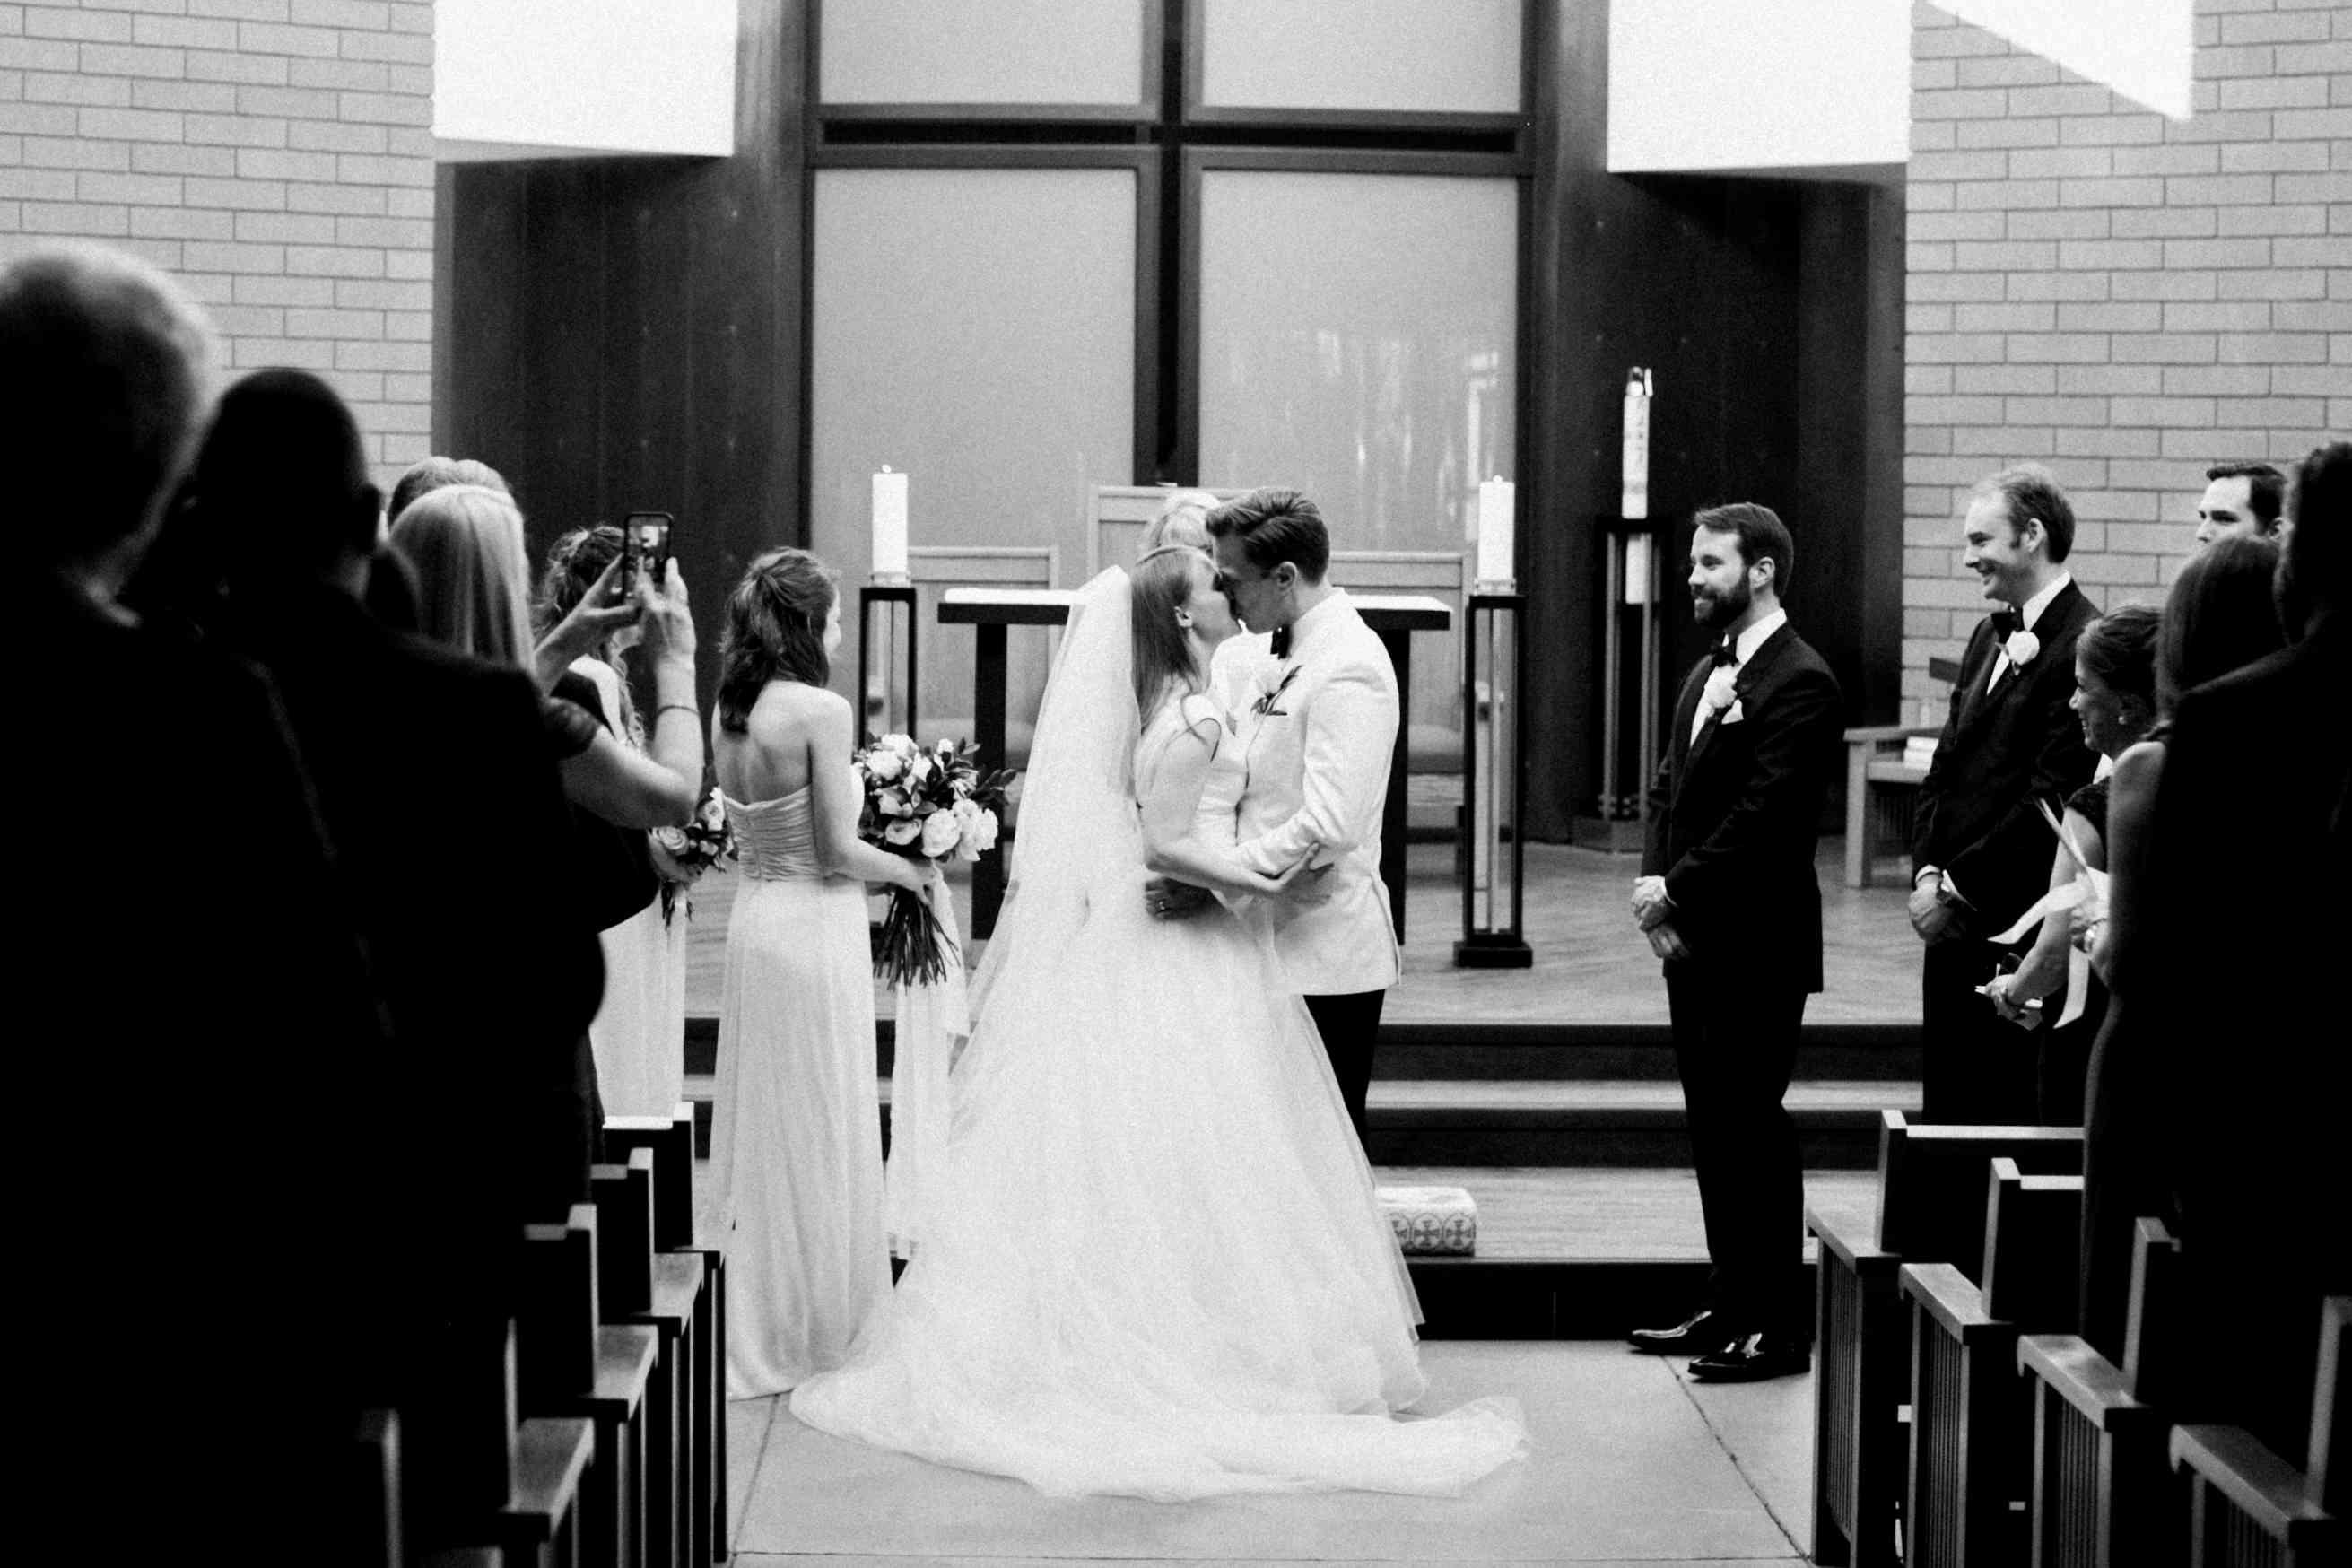 Bride and groom kiss at altar